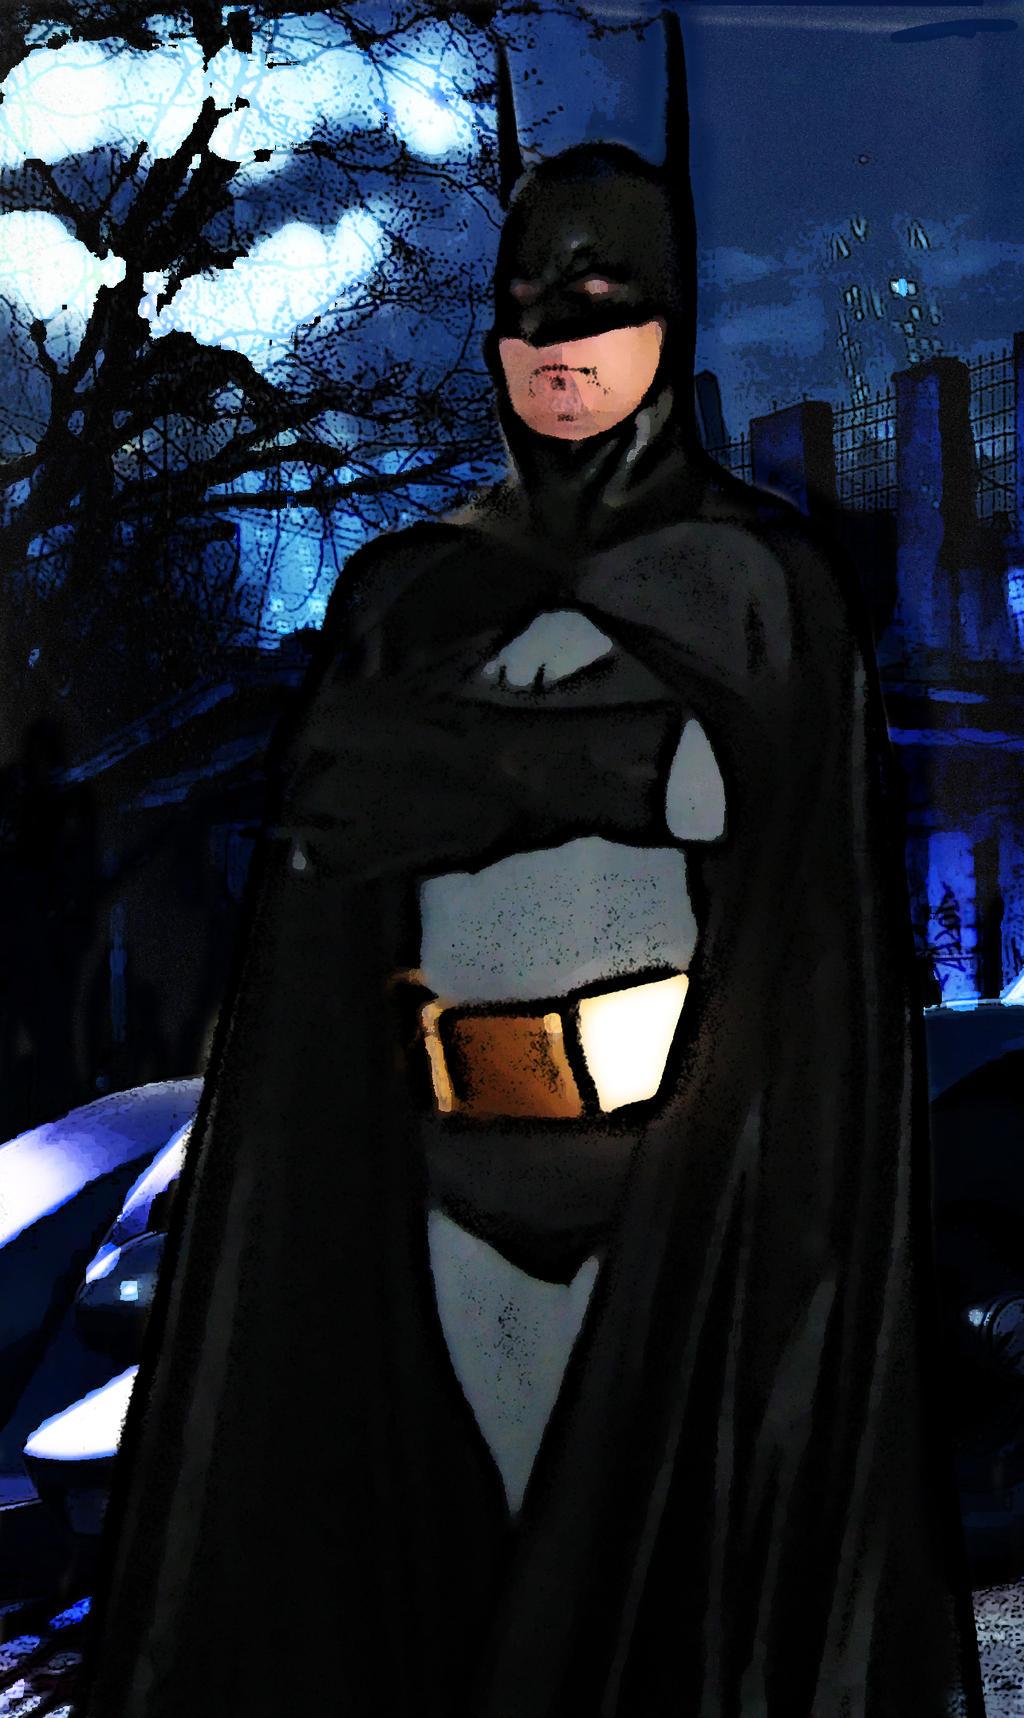 Alex ross batman images The 21 best ALEX ROSS PULP HERO PAINTINGS images on